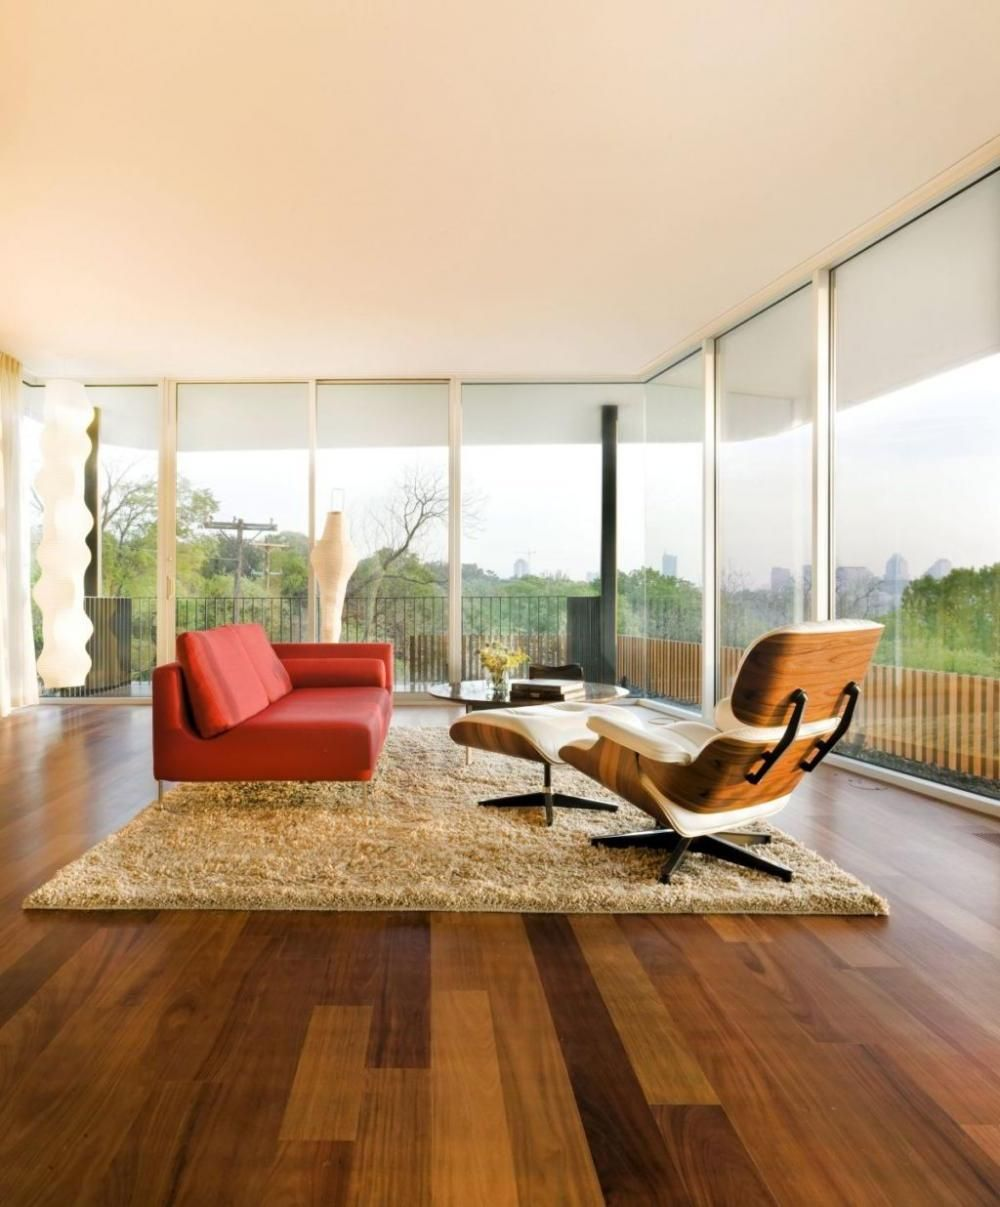 Home Design Inspiration In Great Interior Ideas